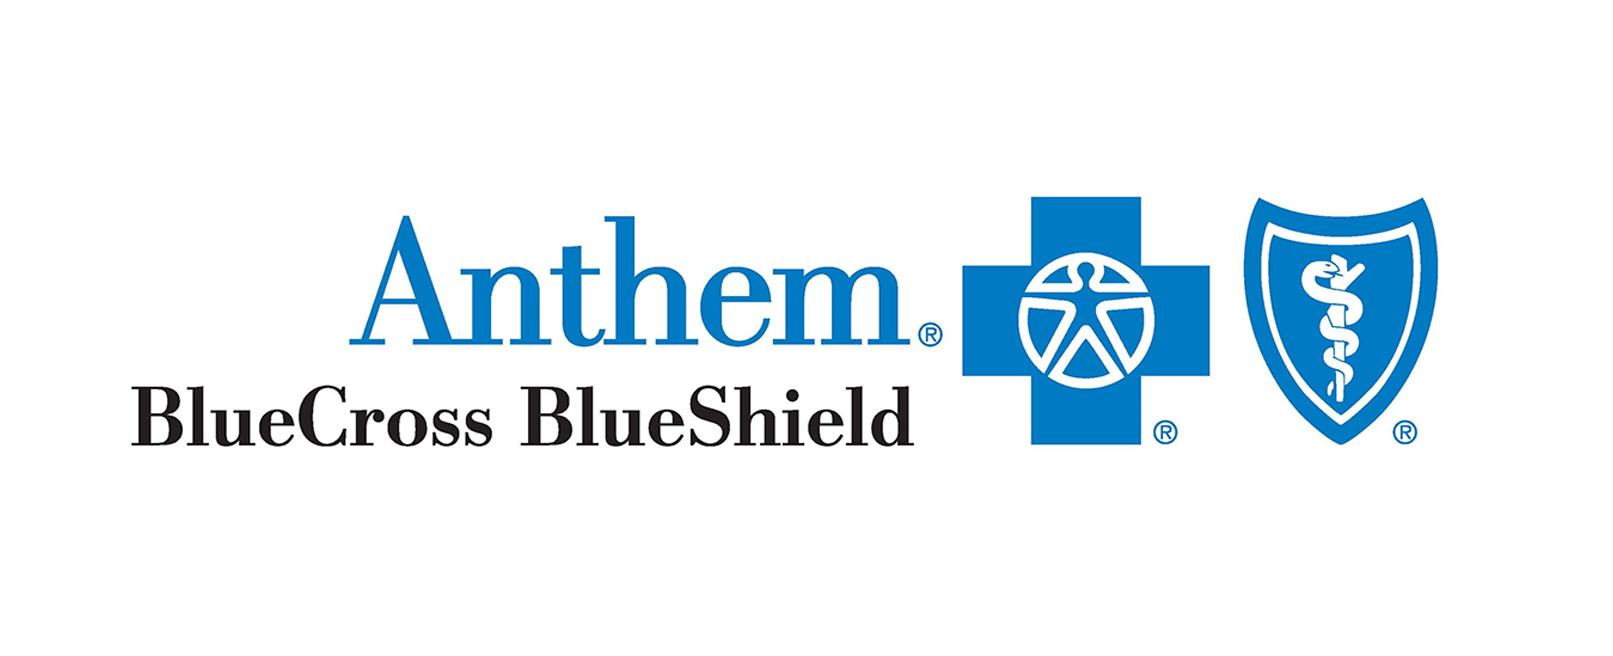 Amthem BlueCross BlueShield